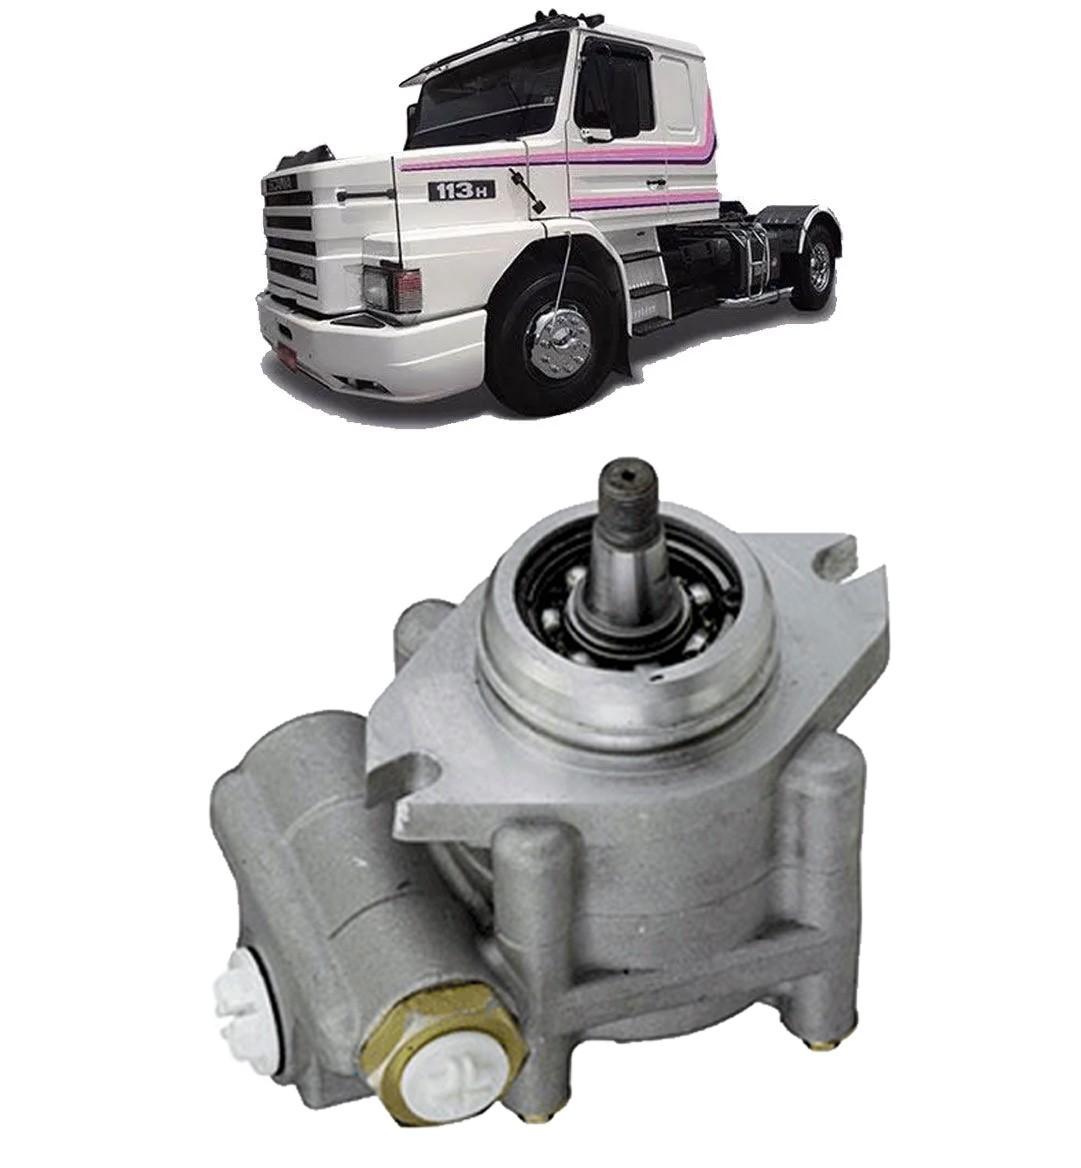 Bomba De Direção Hidráulica Scania Serie 3 / 113